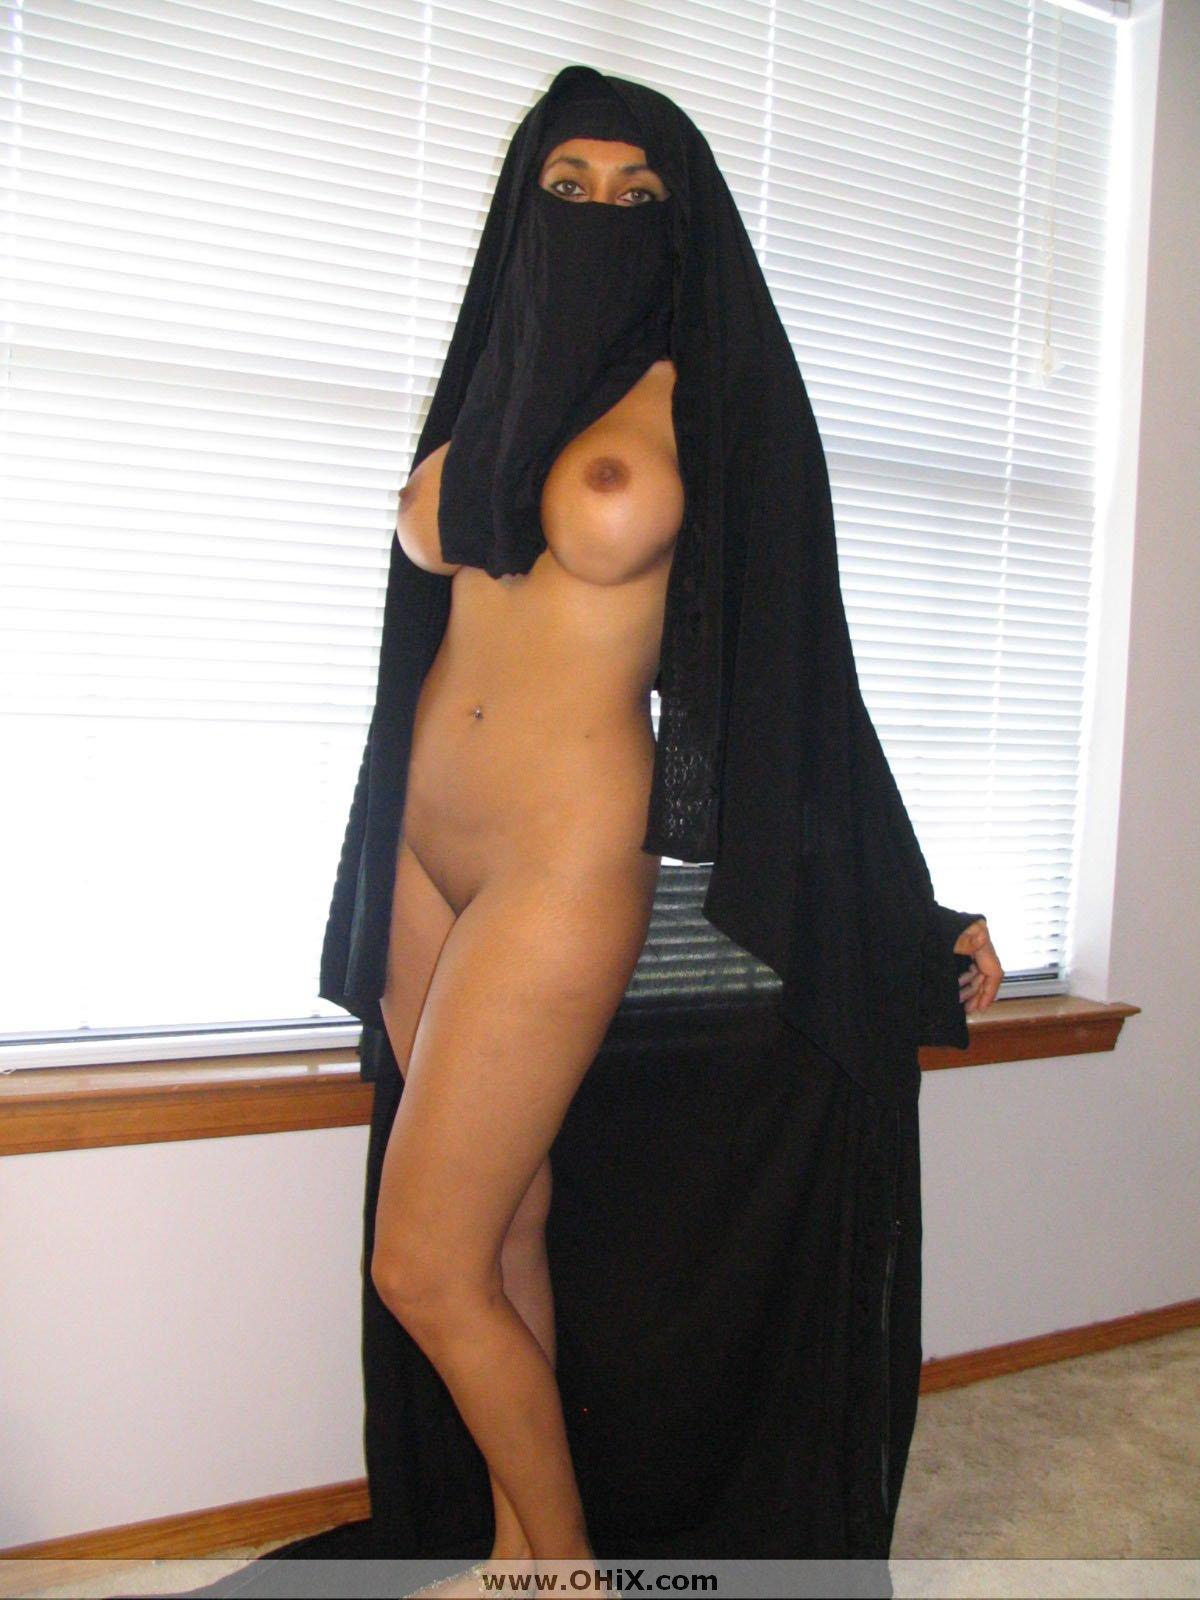 Хиджаб девушки эротика 11 фотография